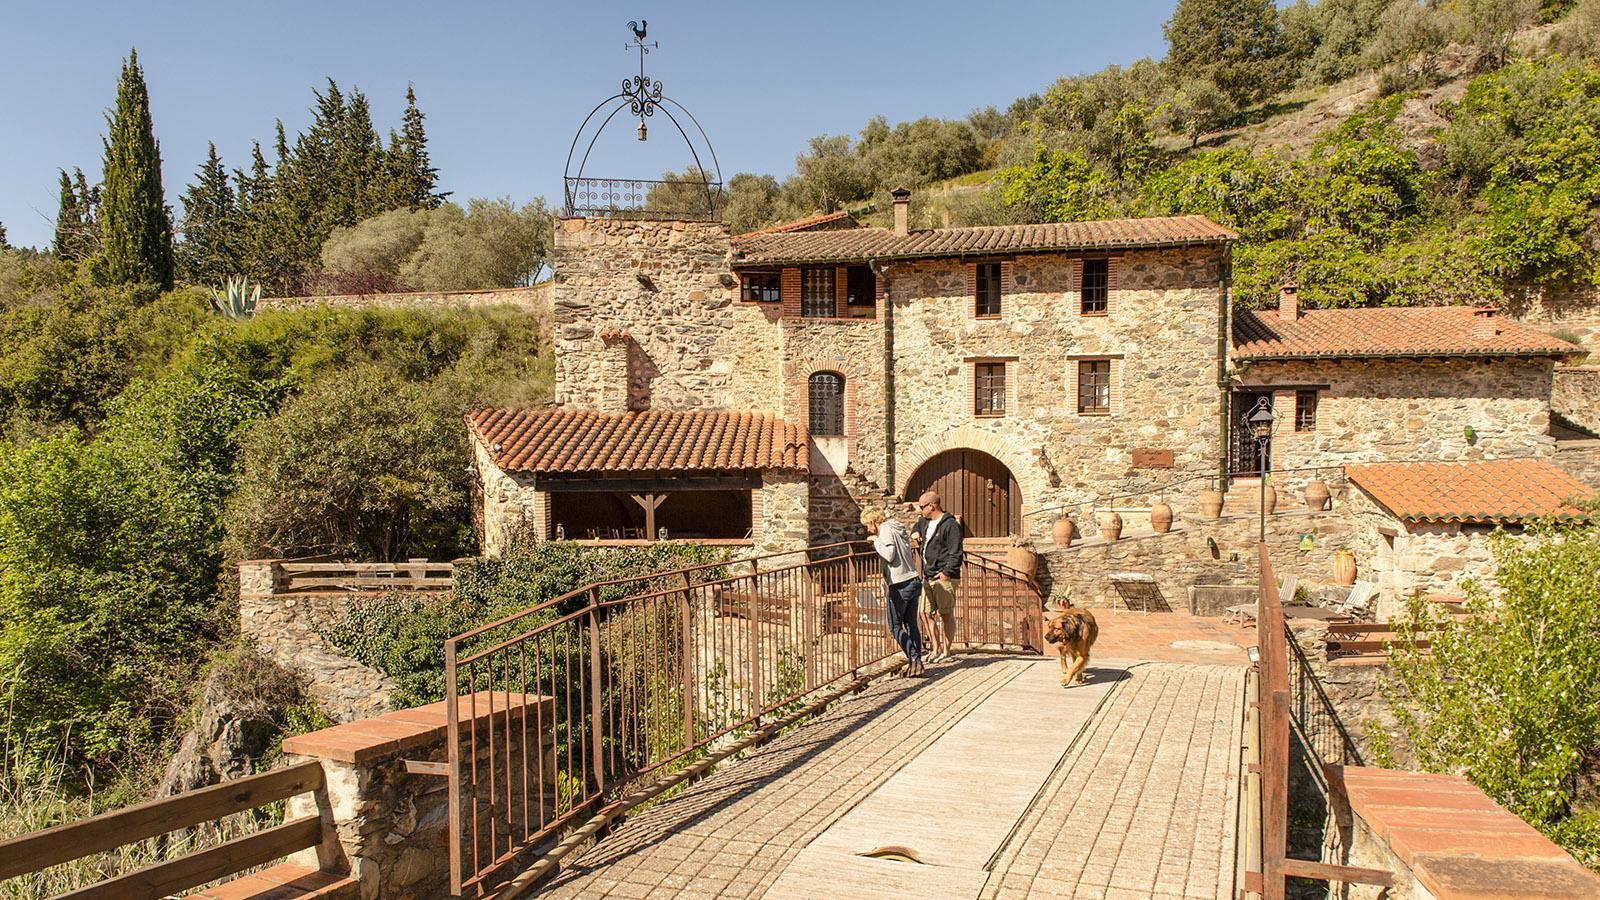 Moulin de Canterrane: die Wassermühle. Foto: Hilke Maunder